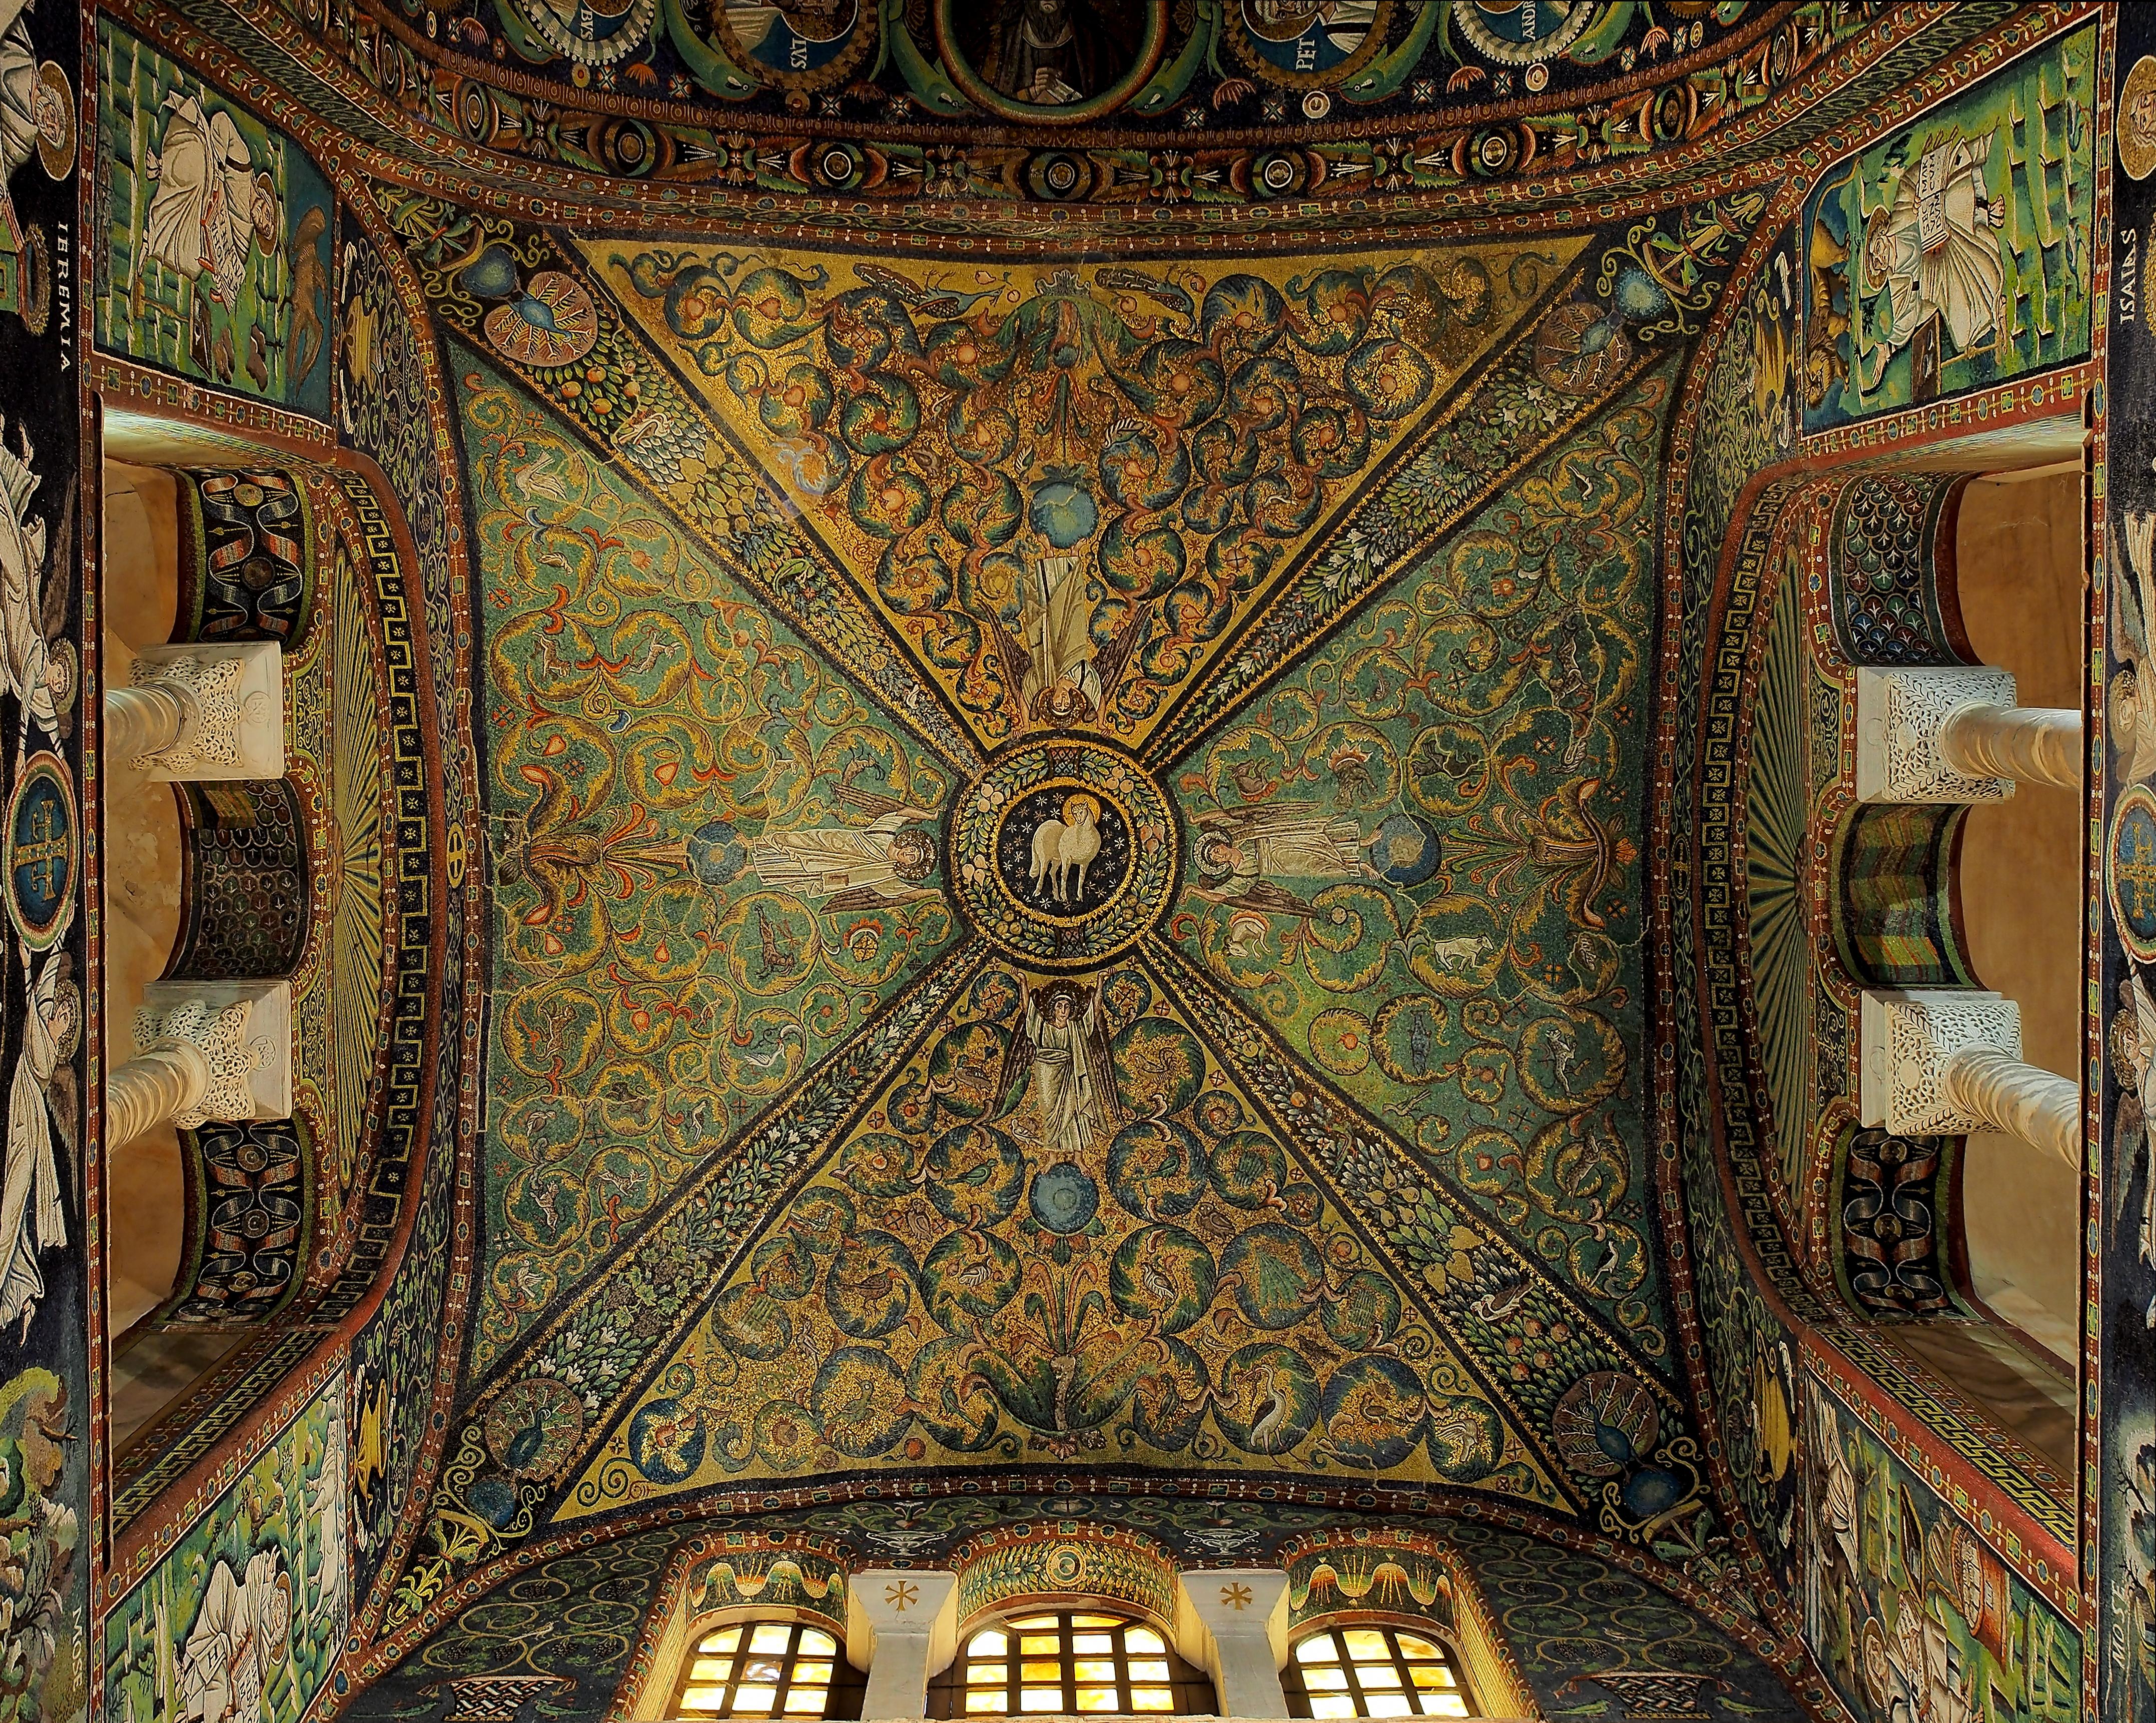 Basilica of San Vitale - Lamb of God mosaic